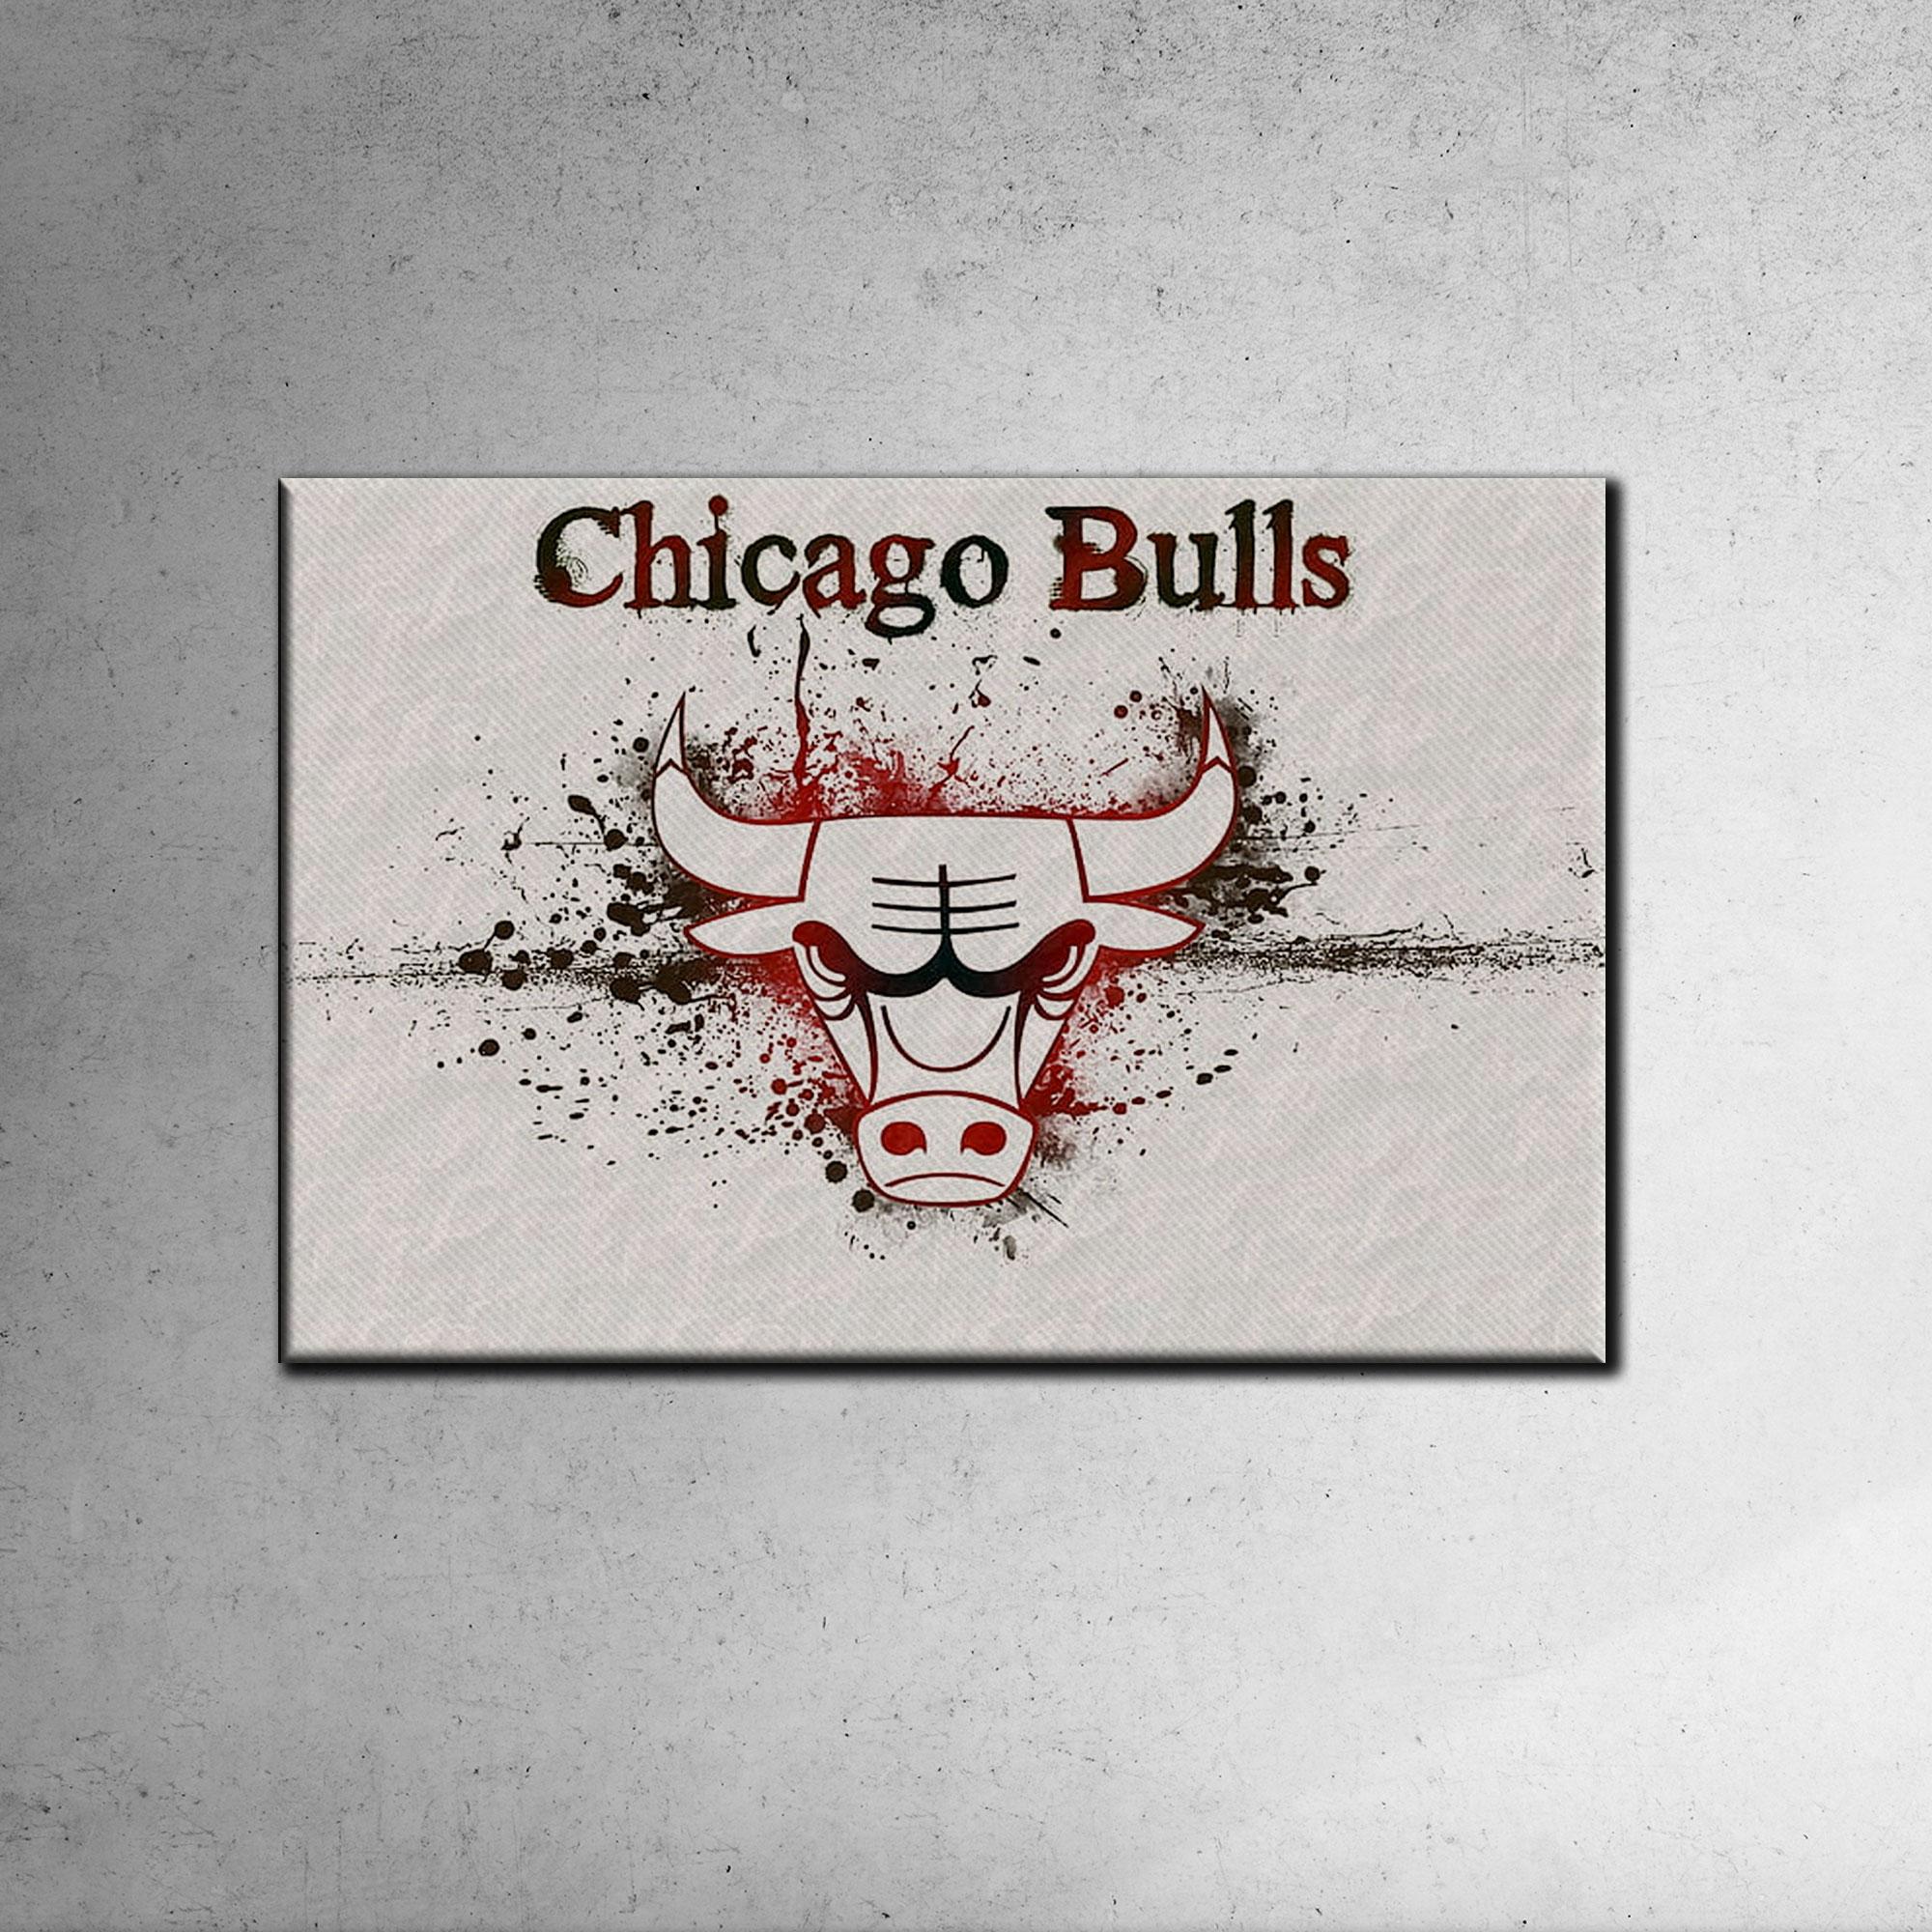 Chicago Bulls Canvas Tablo (Nba-canvas-bulls2)